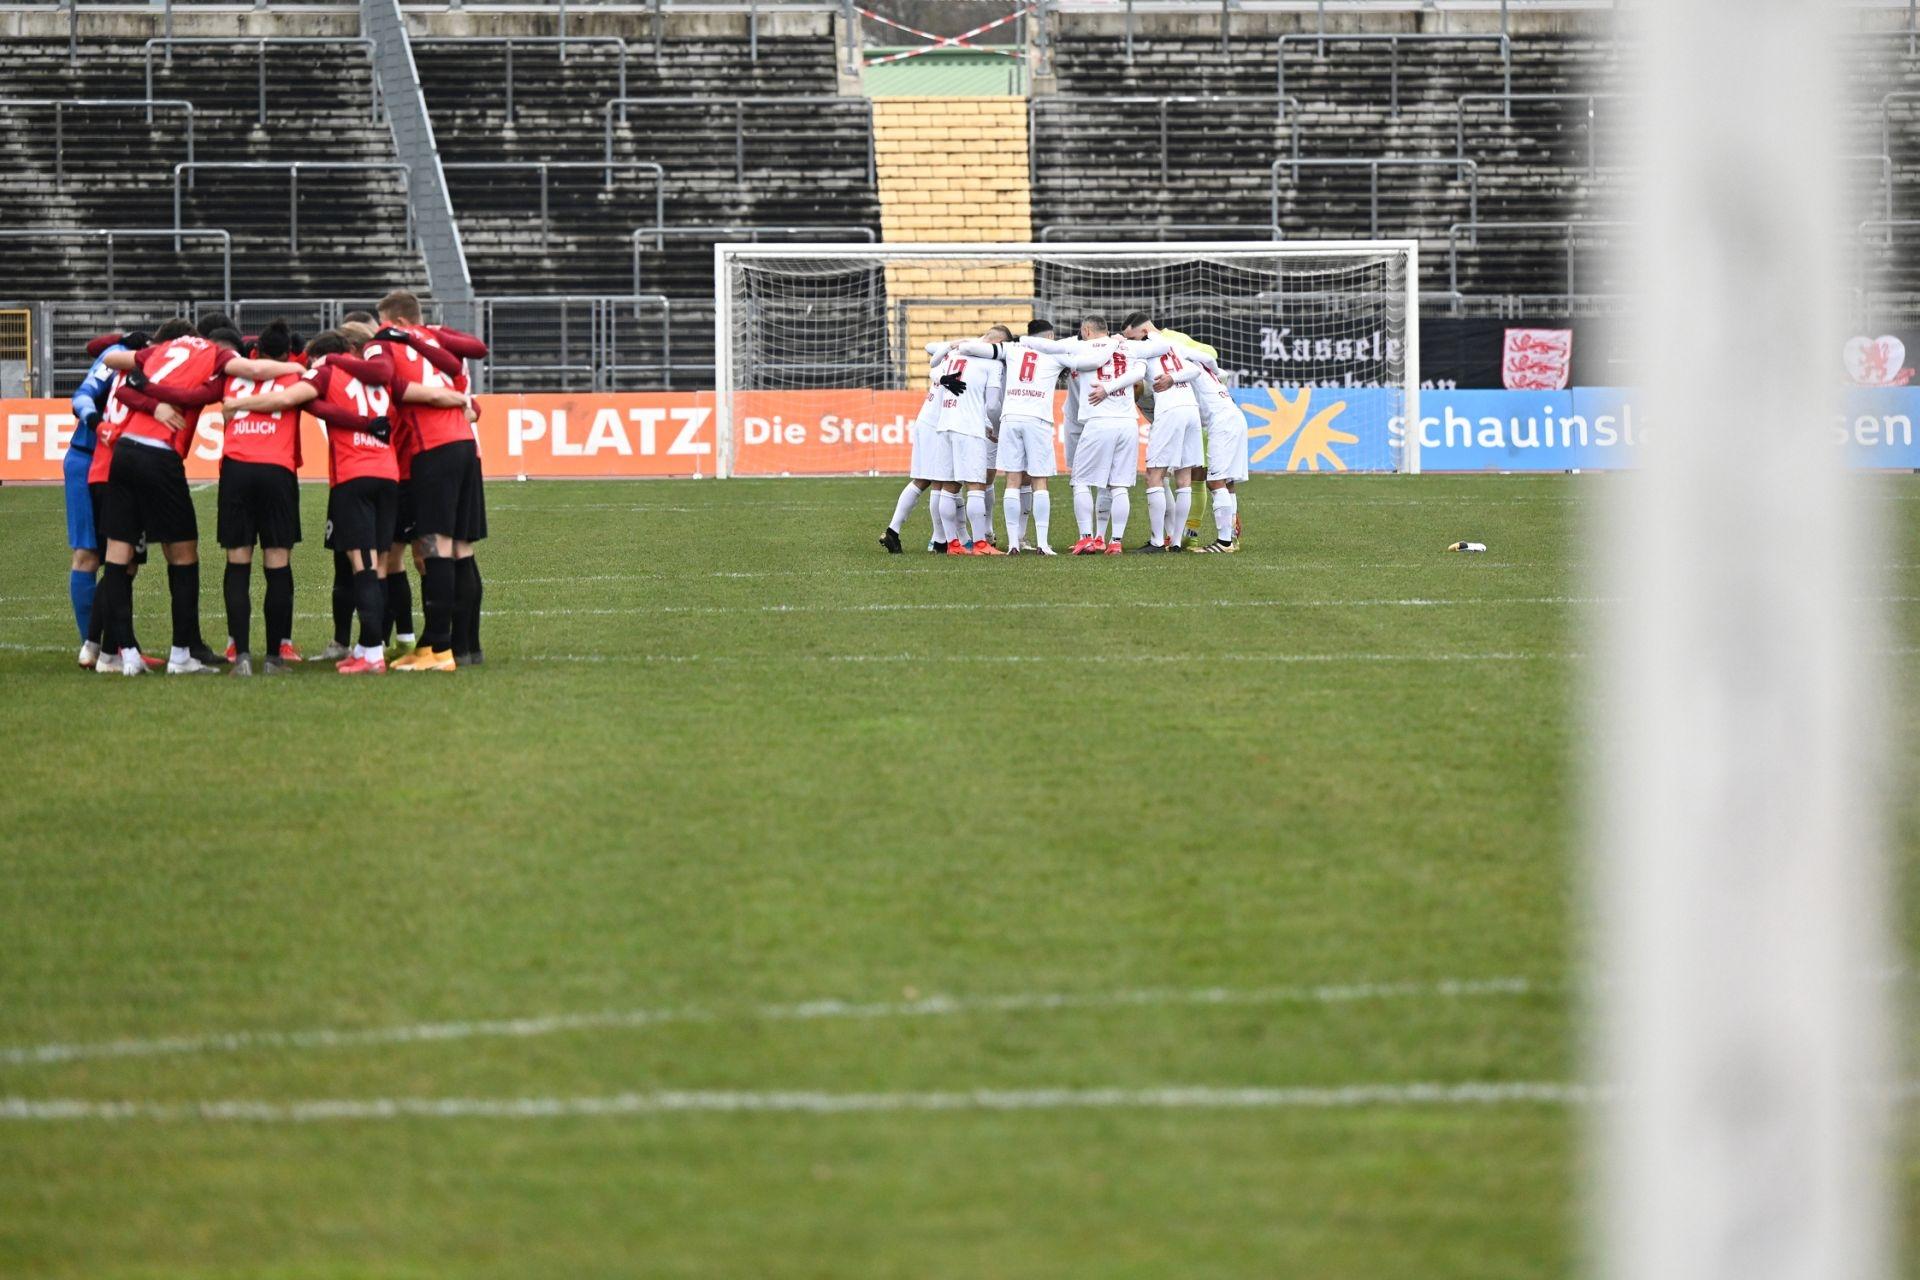 Regionalliga S�dwest 2020/21, KSV Hessen Kassel, SG Sonnenhof Grossaspach, Endstand 0:2, Mannschaftskreis